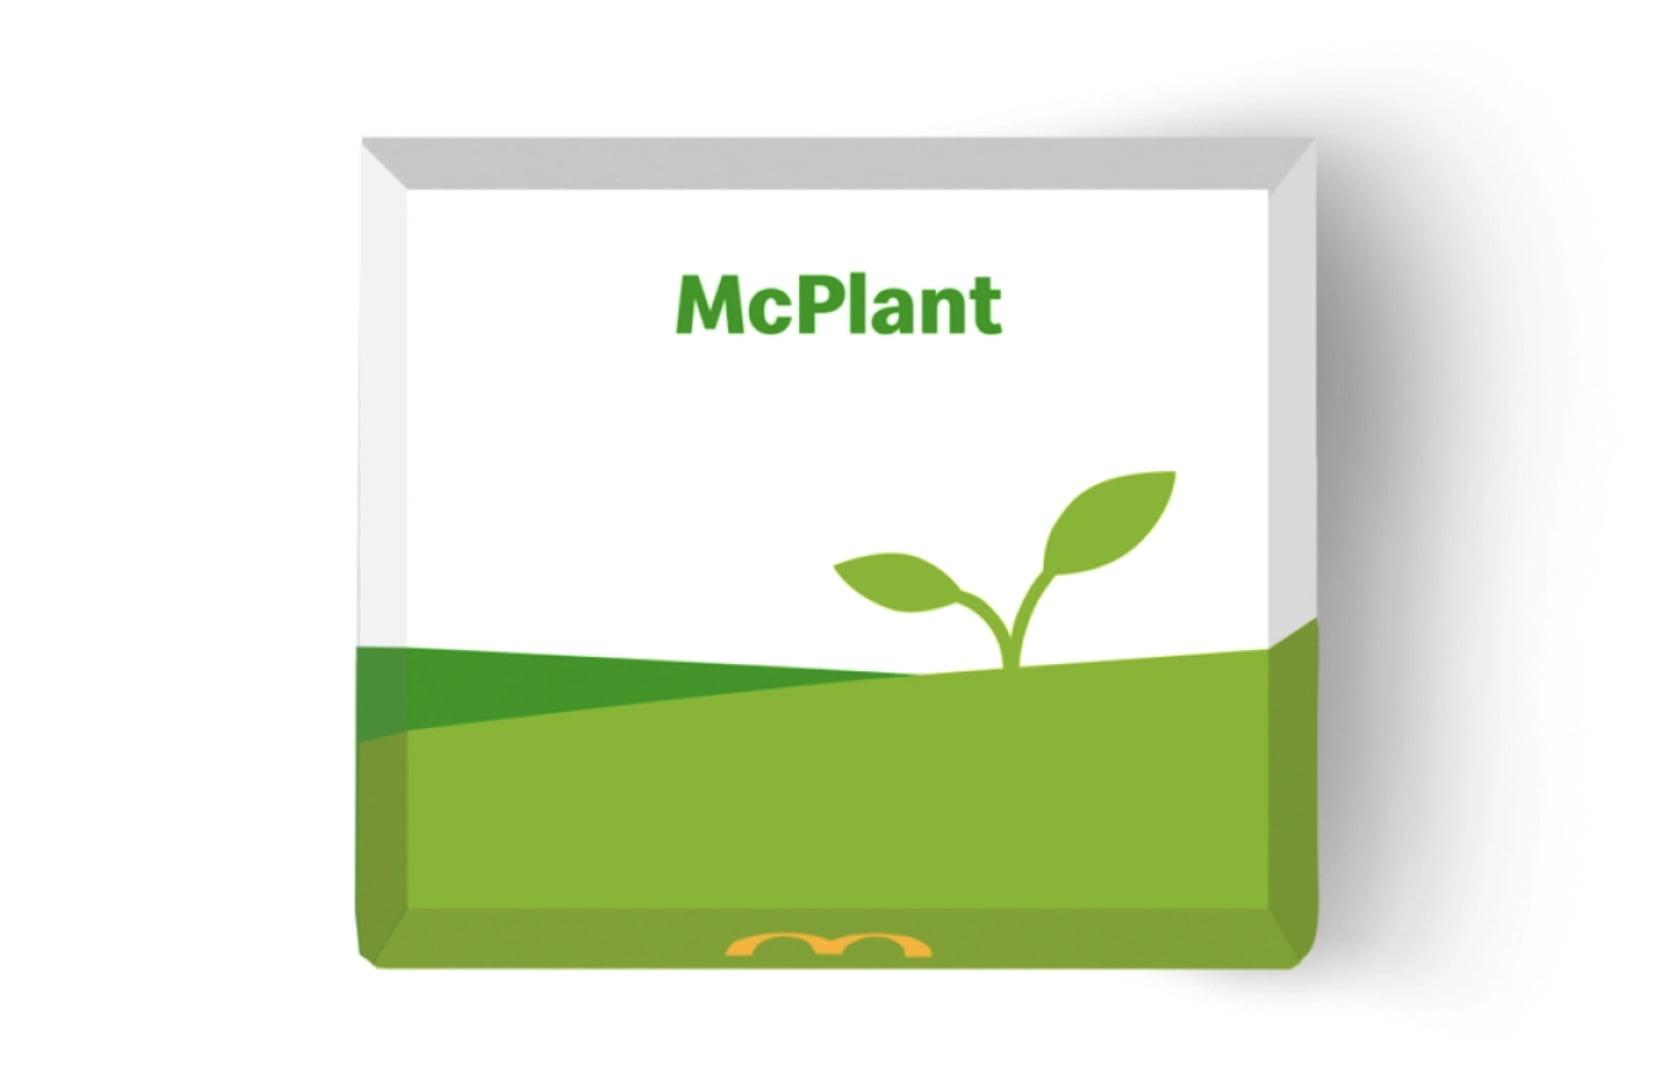 hamburger vegetali McDonald's McPlant